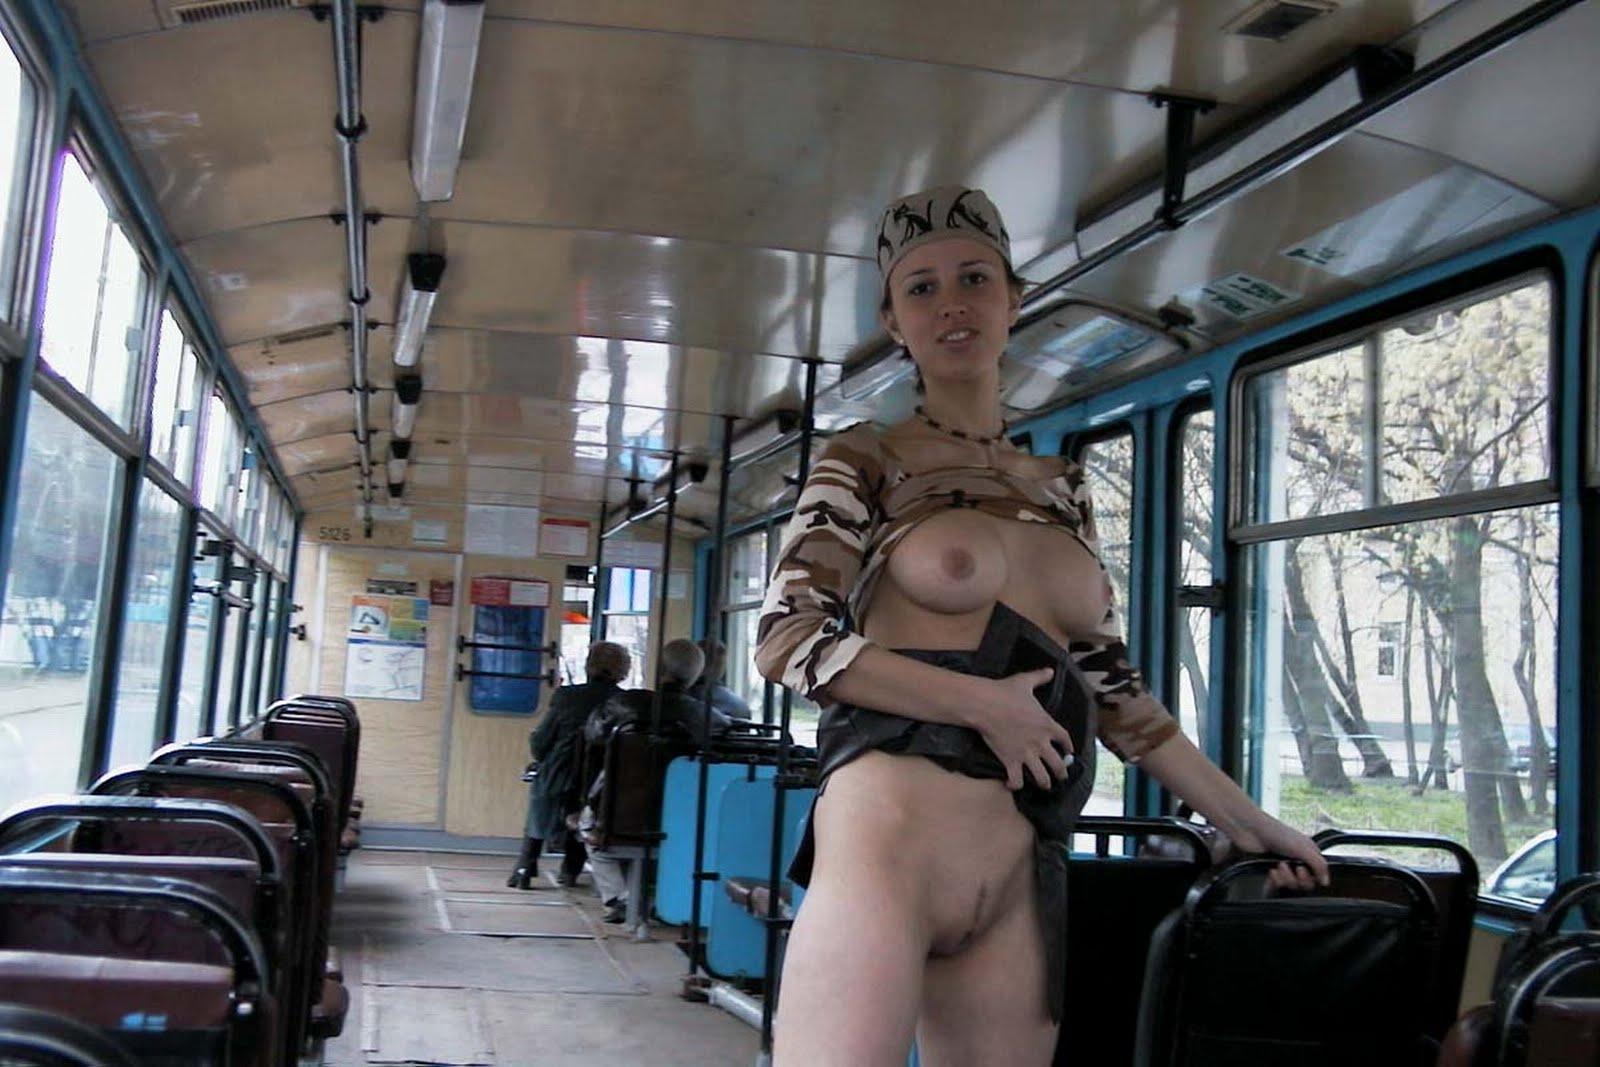 pizde-kartinkah-bez-trusikov-v-transporte-foto-video-anal-russkih